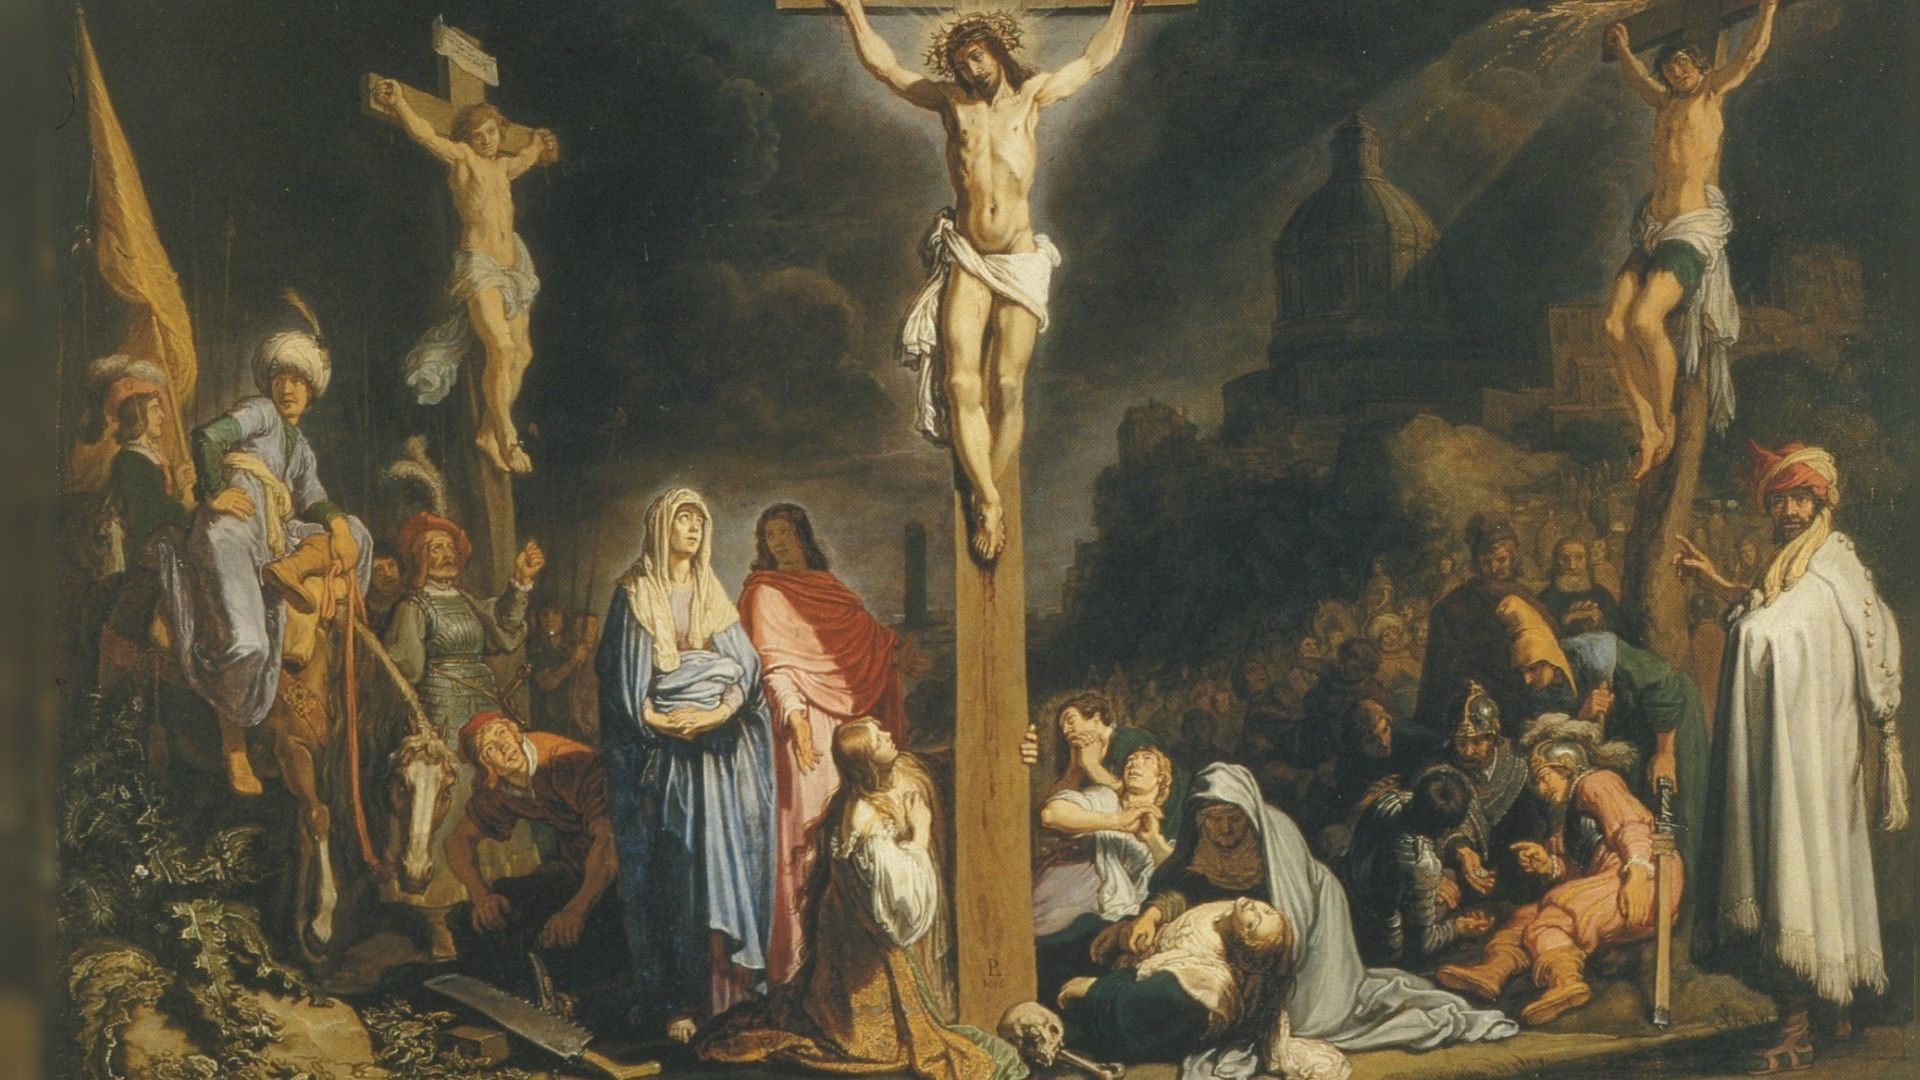 1920x1080 Jesus Christ Crucifixion Wallpaper Set 15 Download Guitar